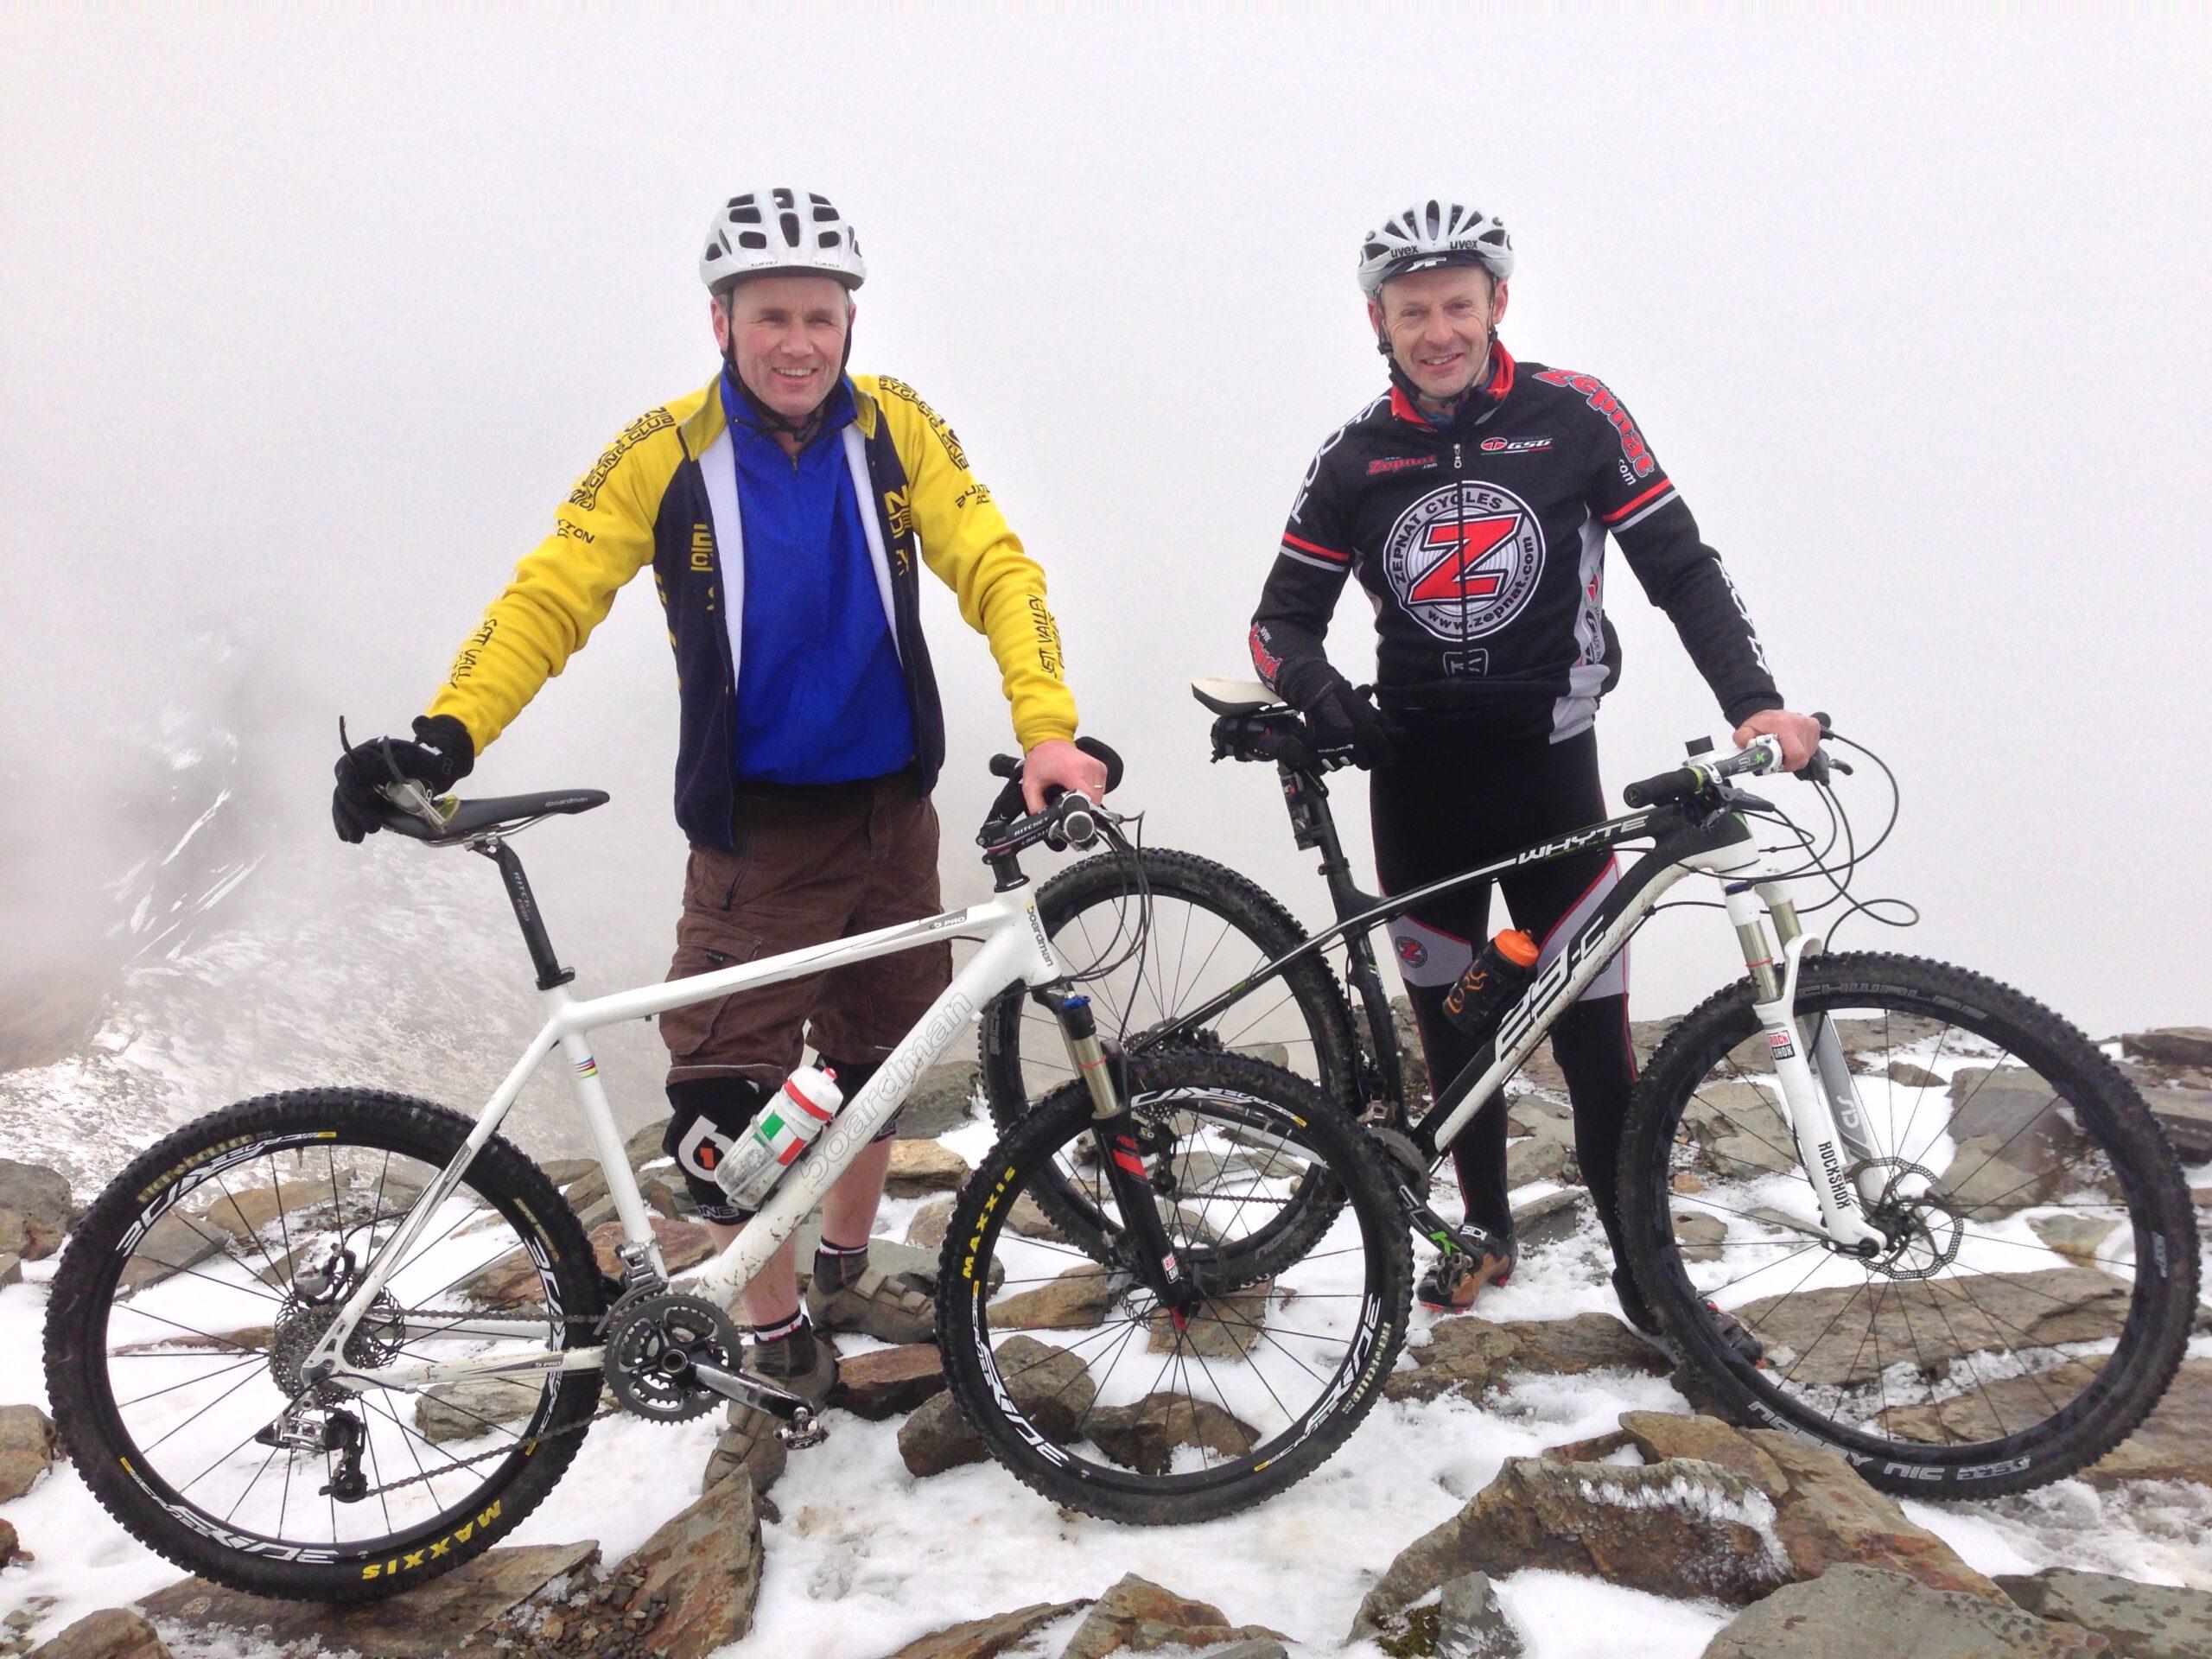 Top of Mount Snowdon April 2013 (photo: R. Cummings)